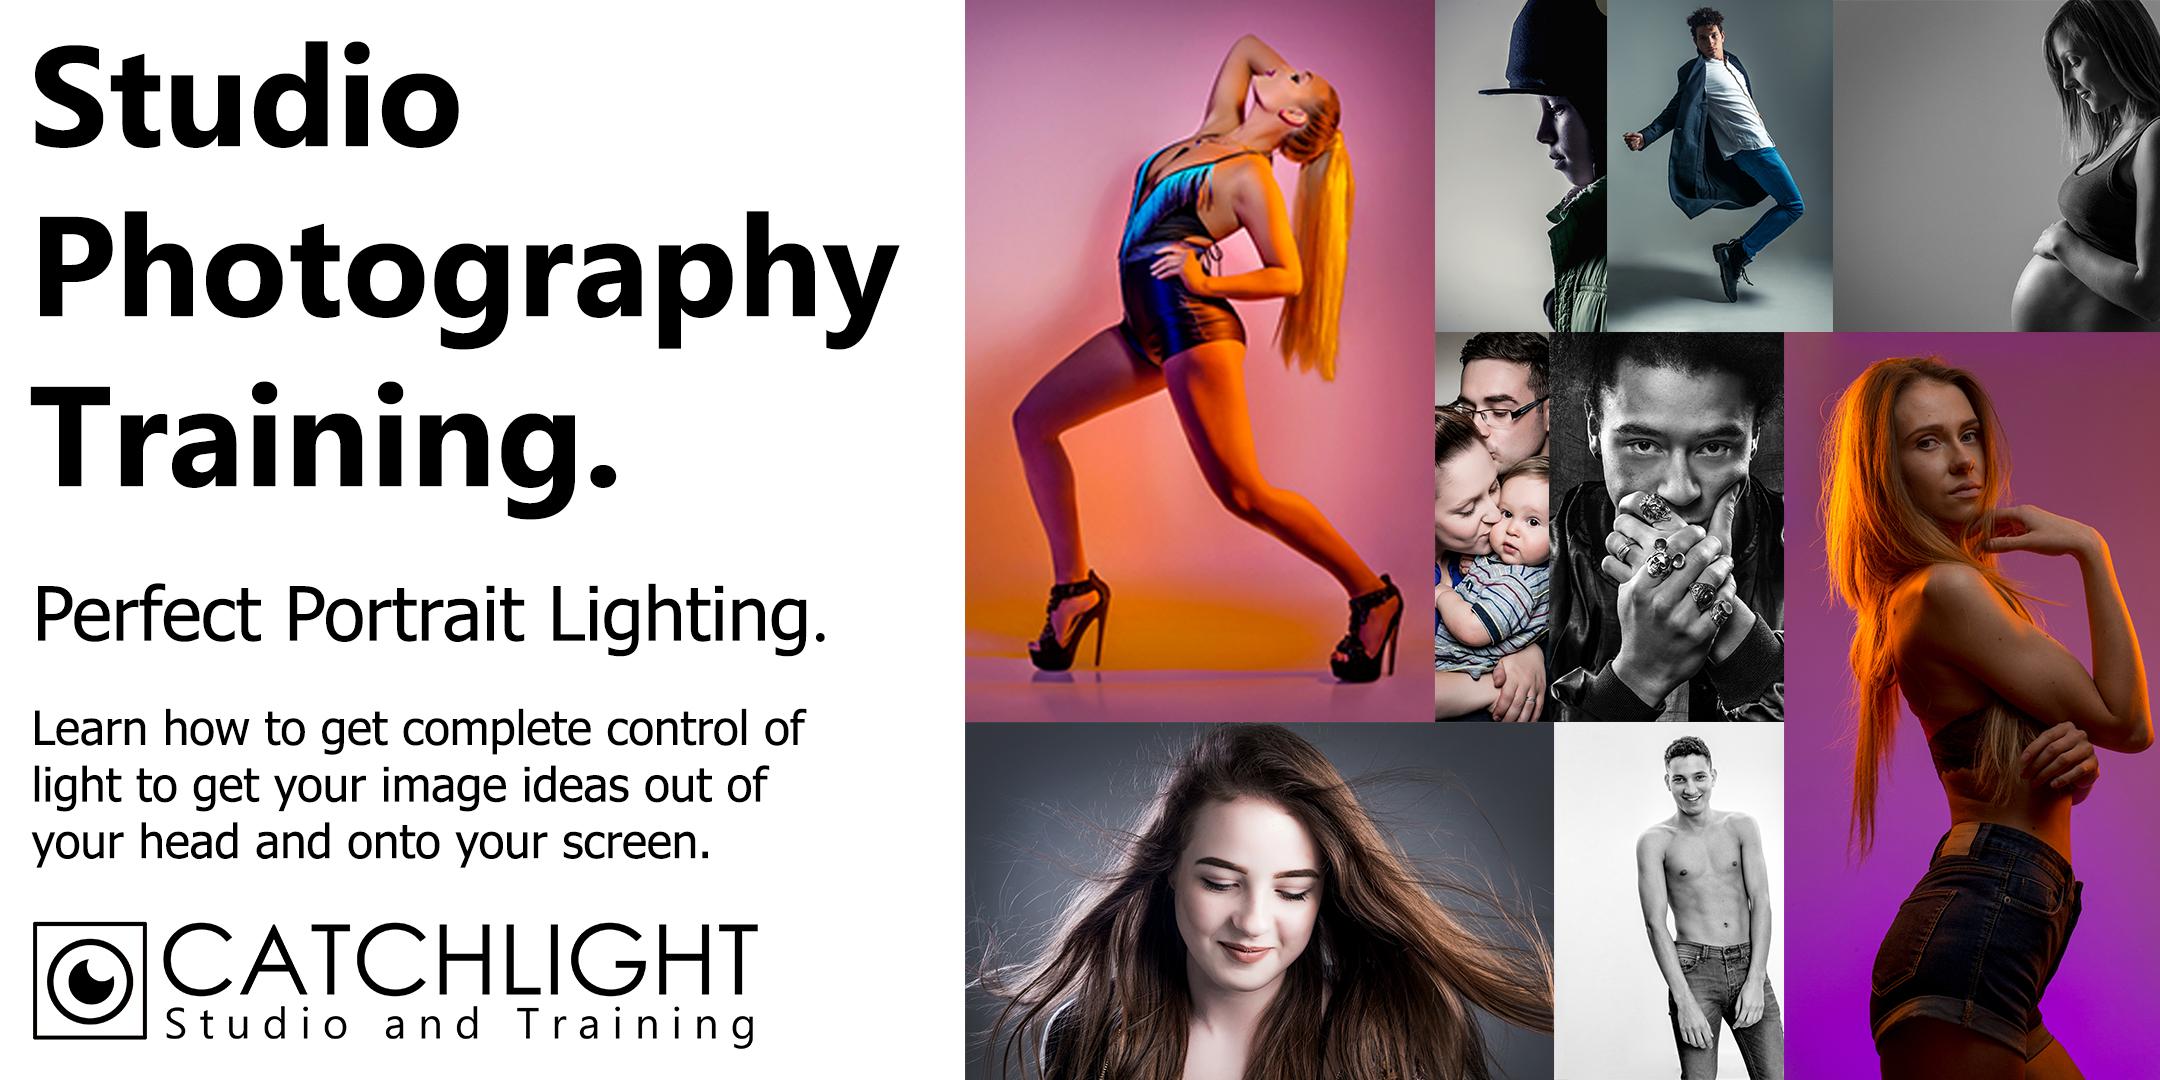 perfect portrait lighting